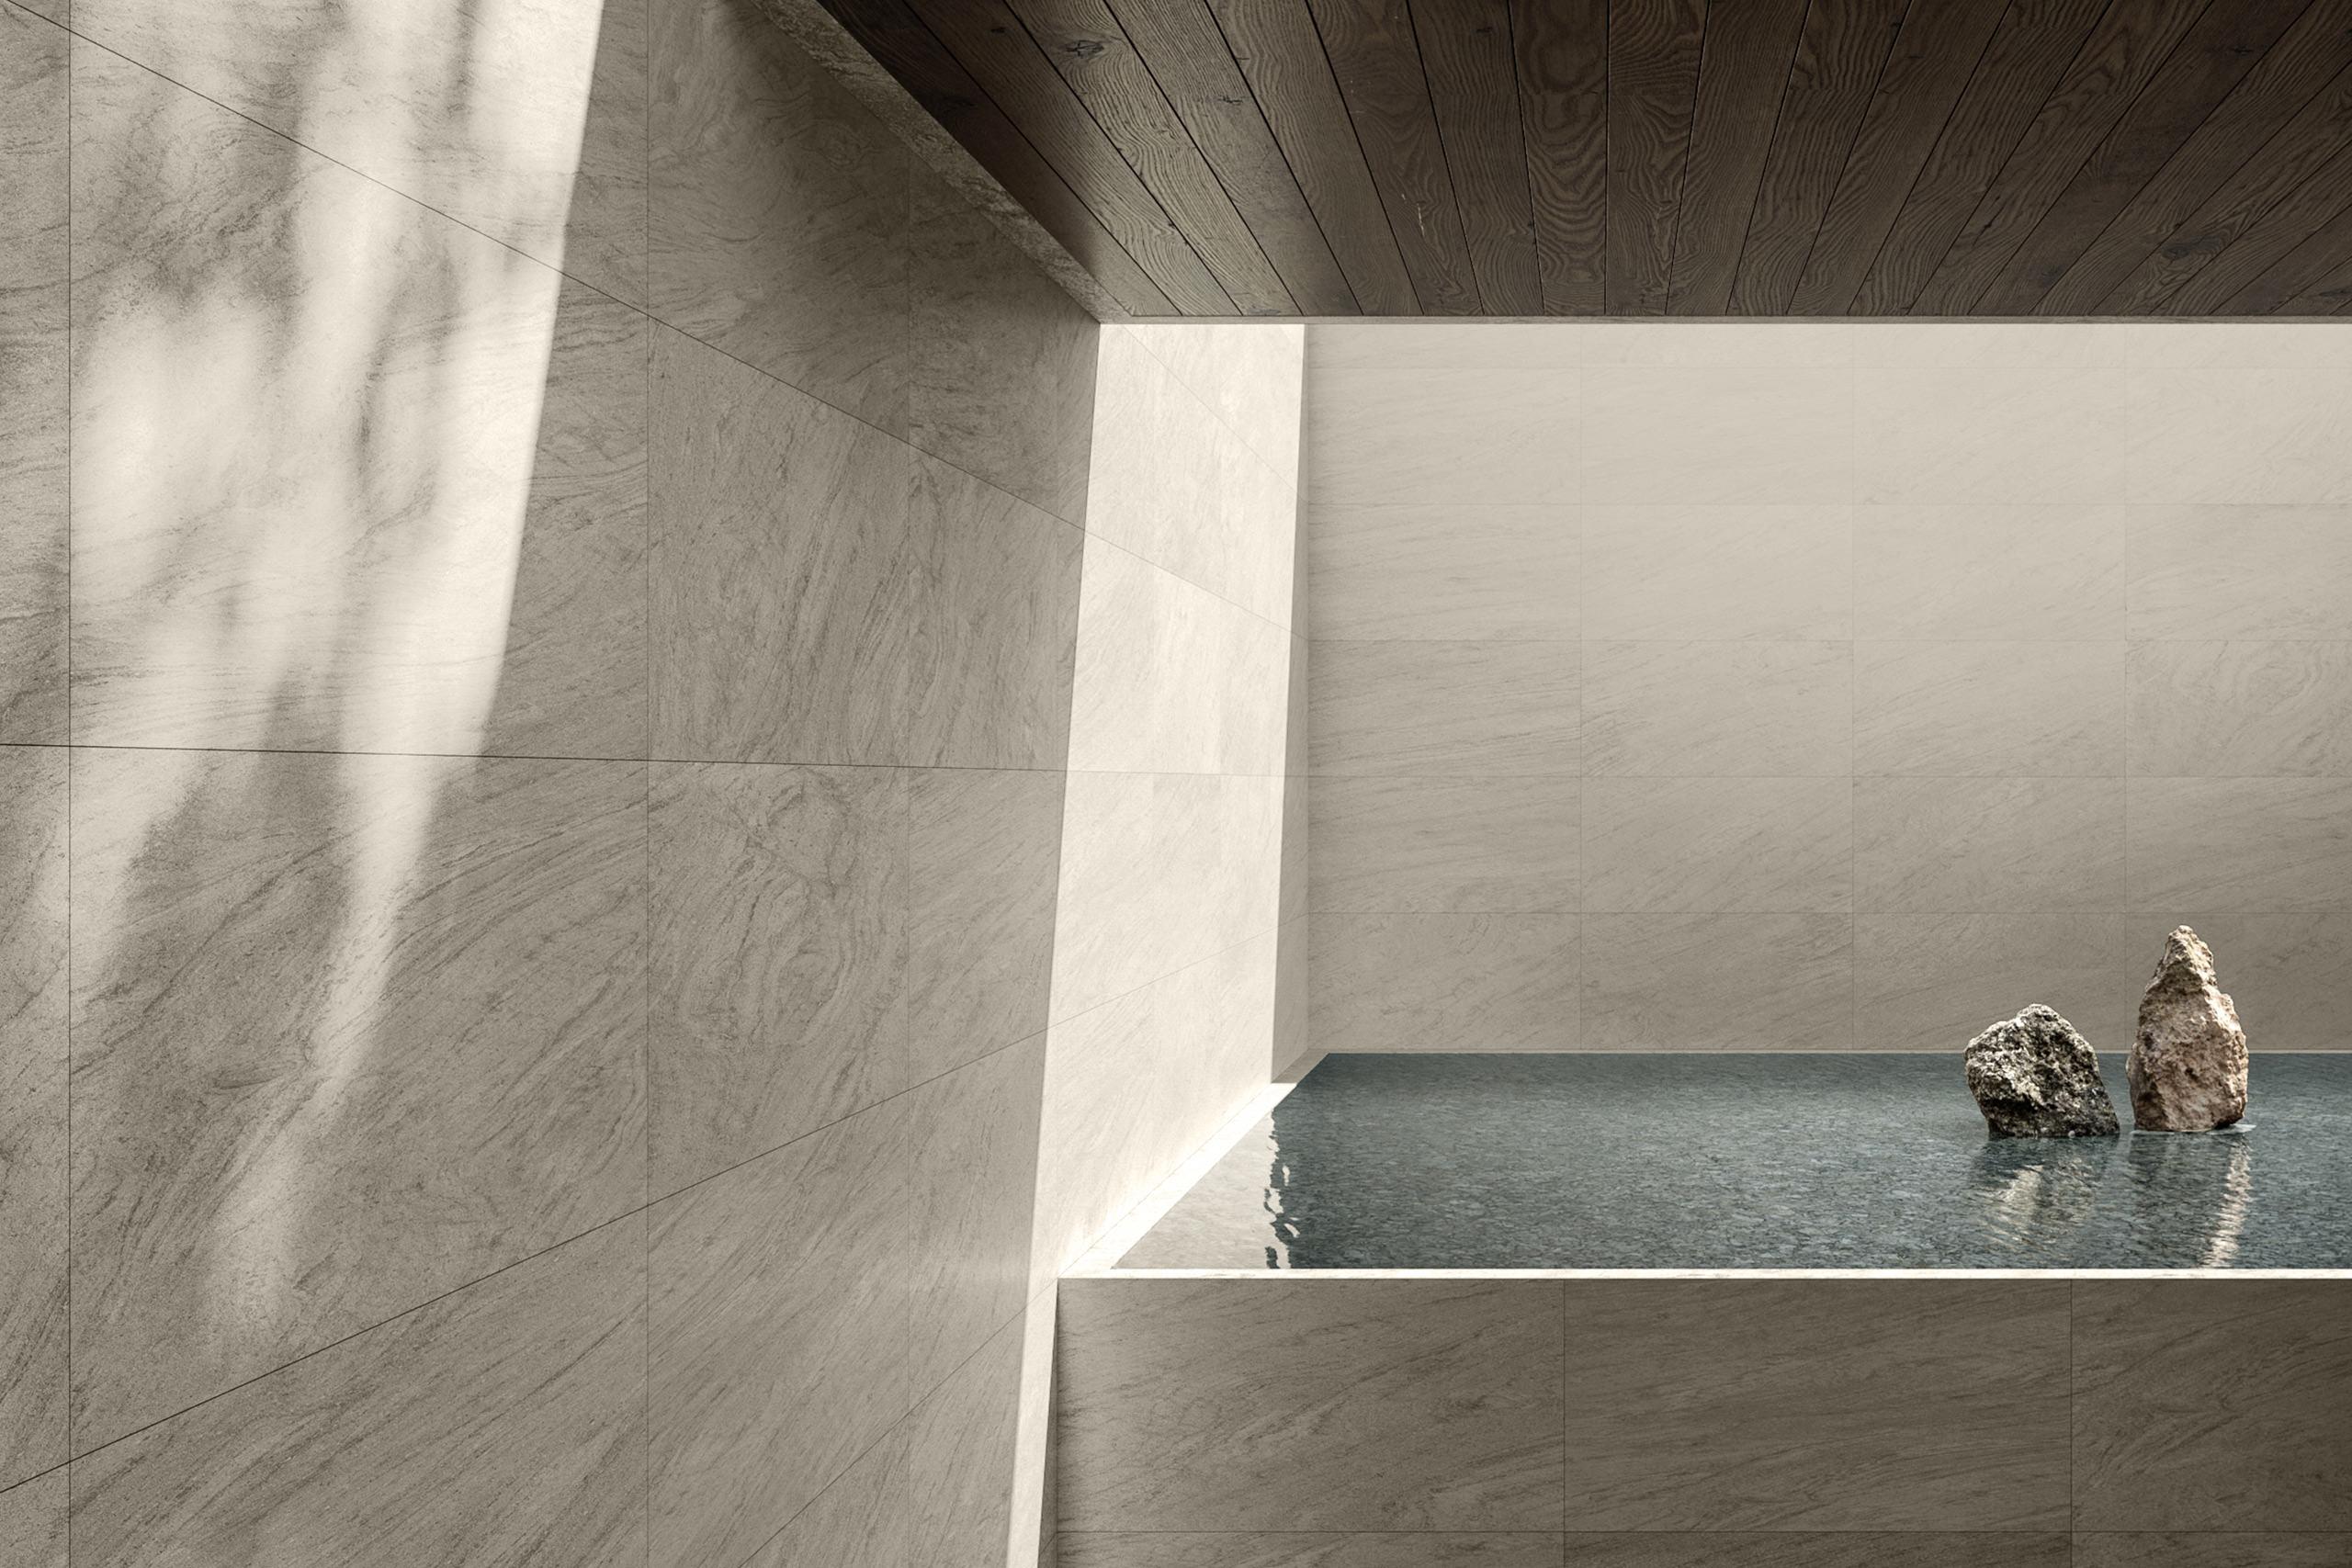 Rendering esterni interni fotorealistici Caesar piscina 2